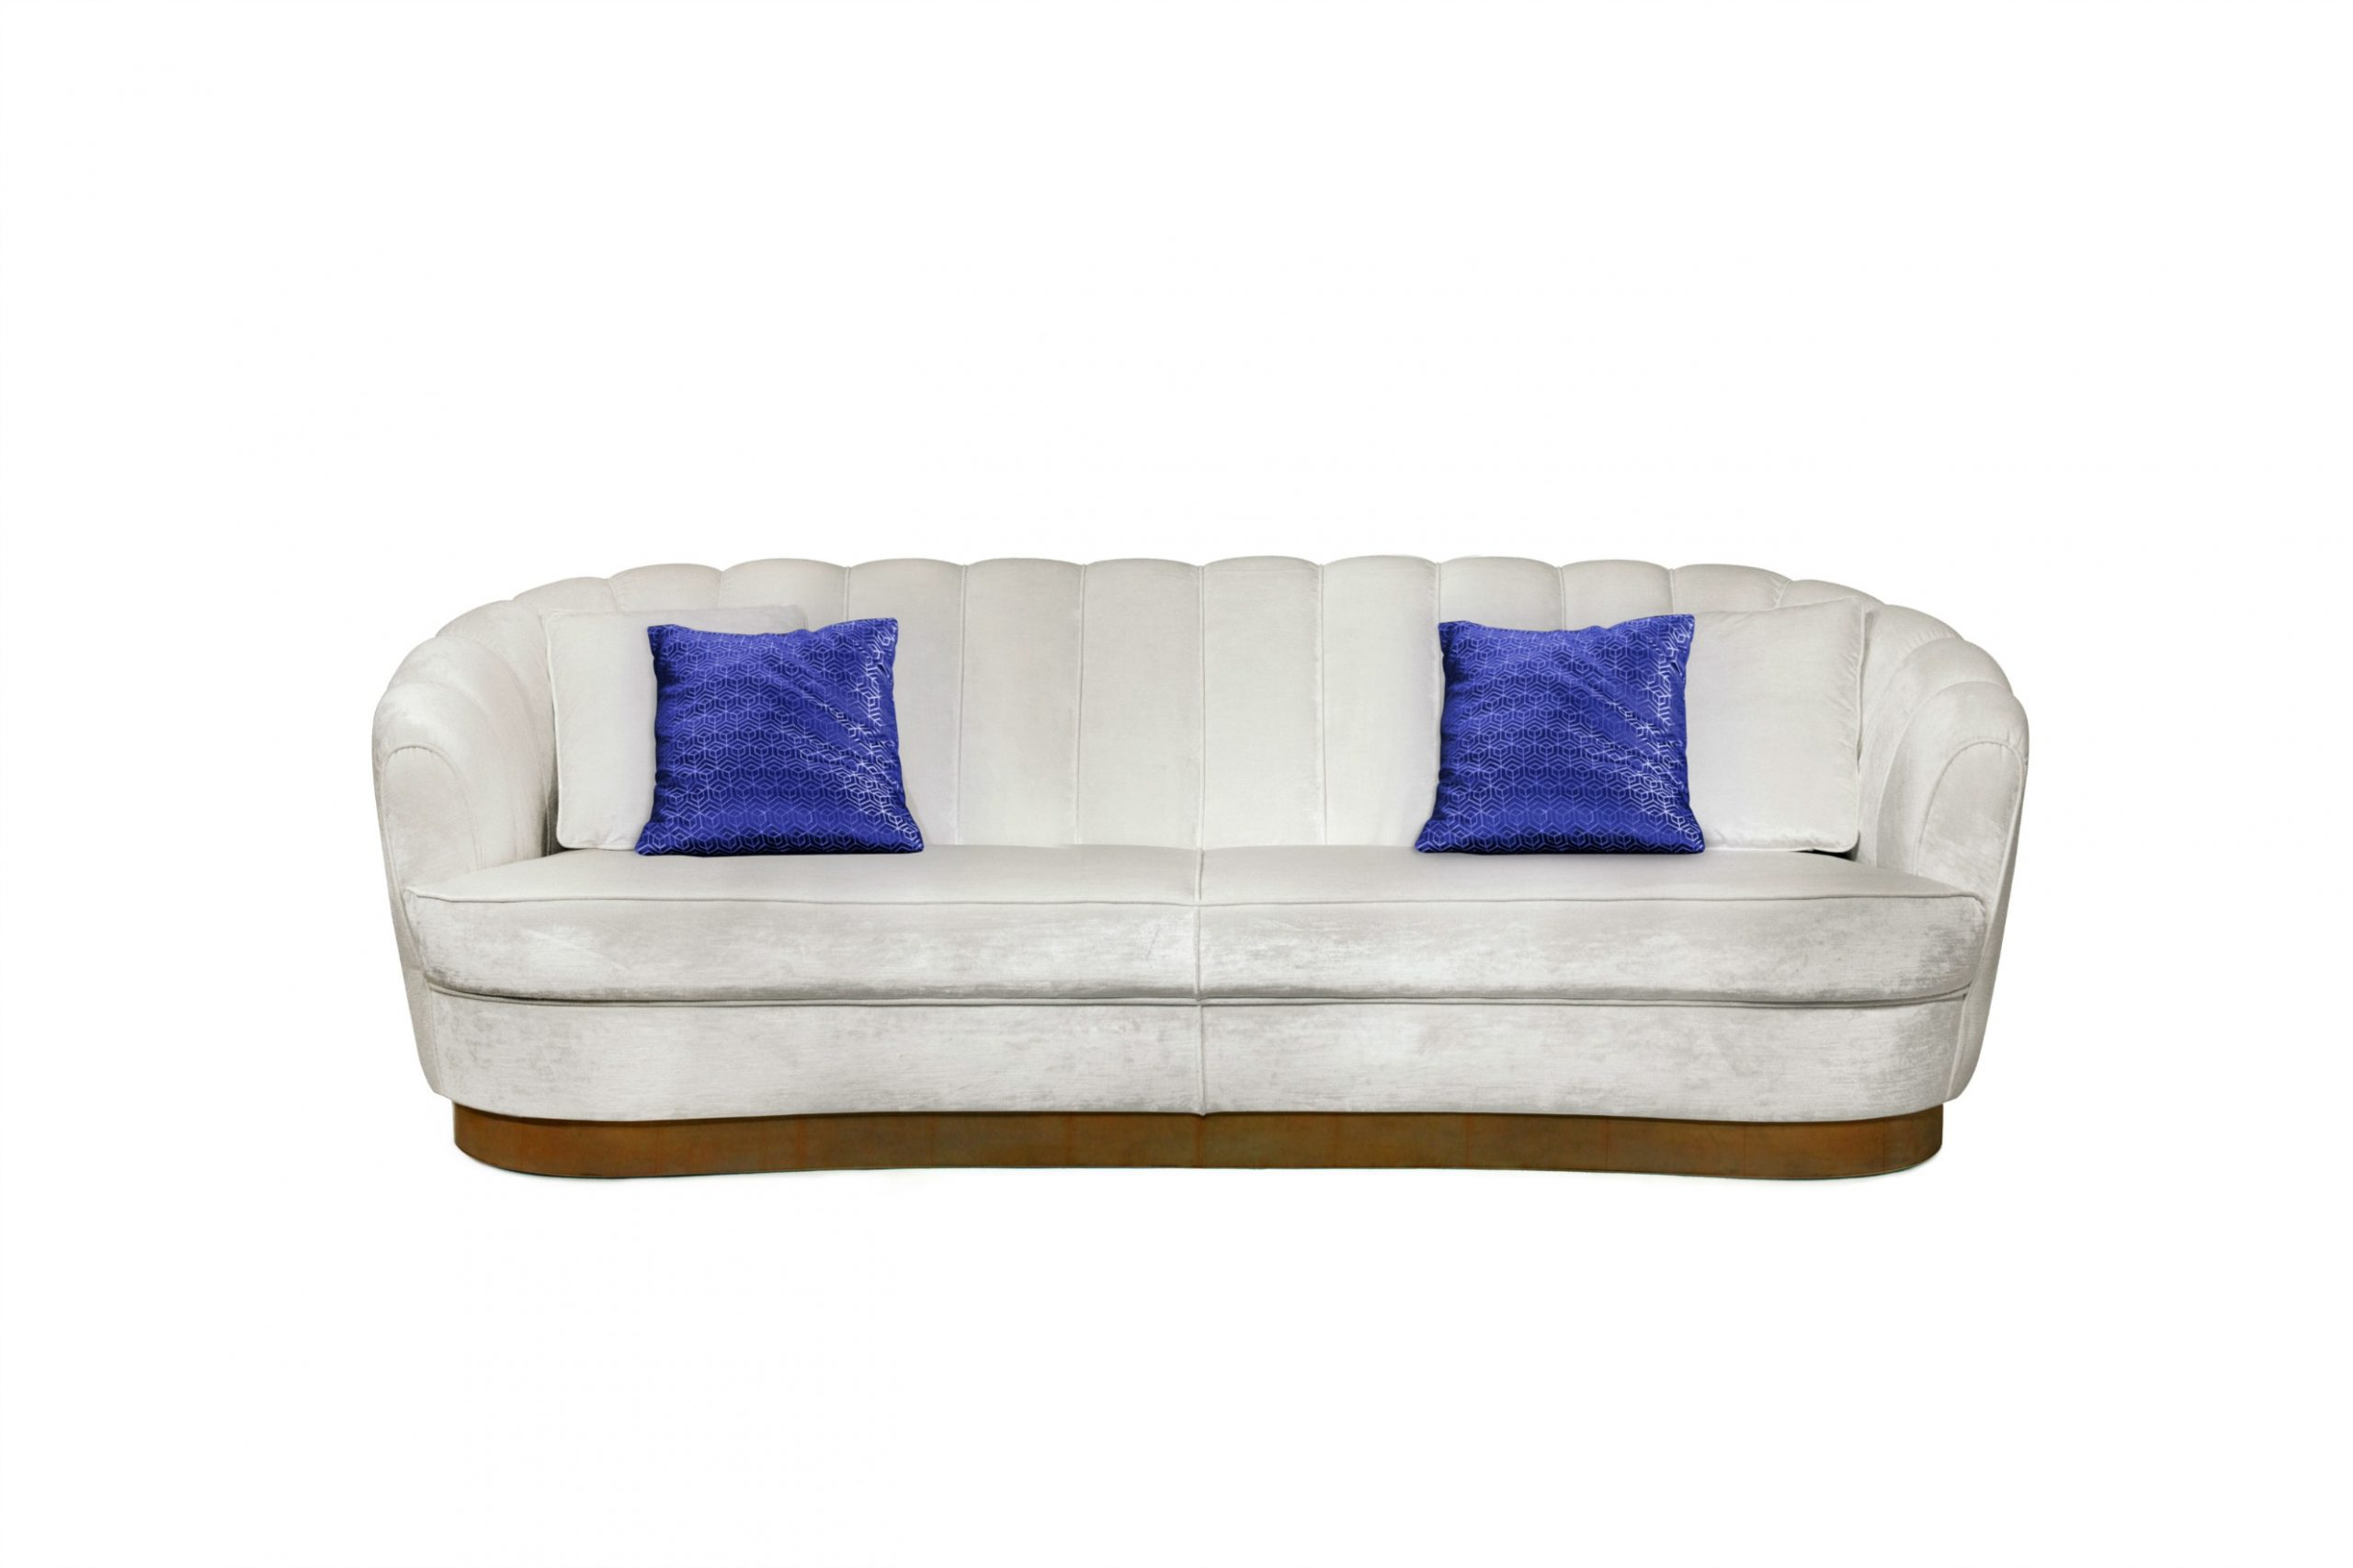 White Sofas - Discover How Elegant This Color Can Be white sofas White Sofas – Discover How Elegant This Color Can Be pearl sofa 1 HR scaled